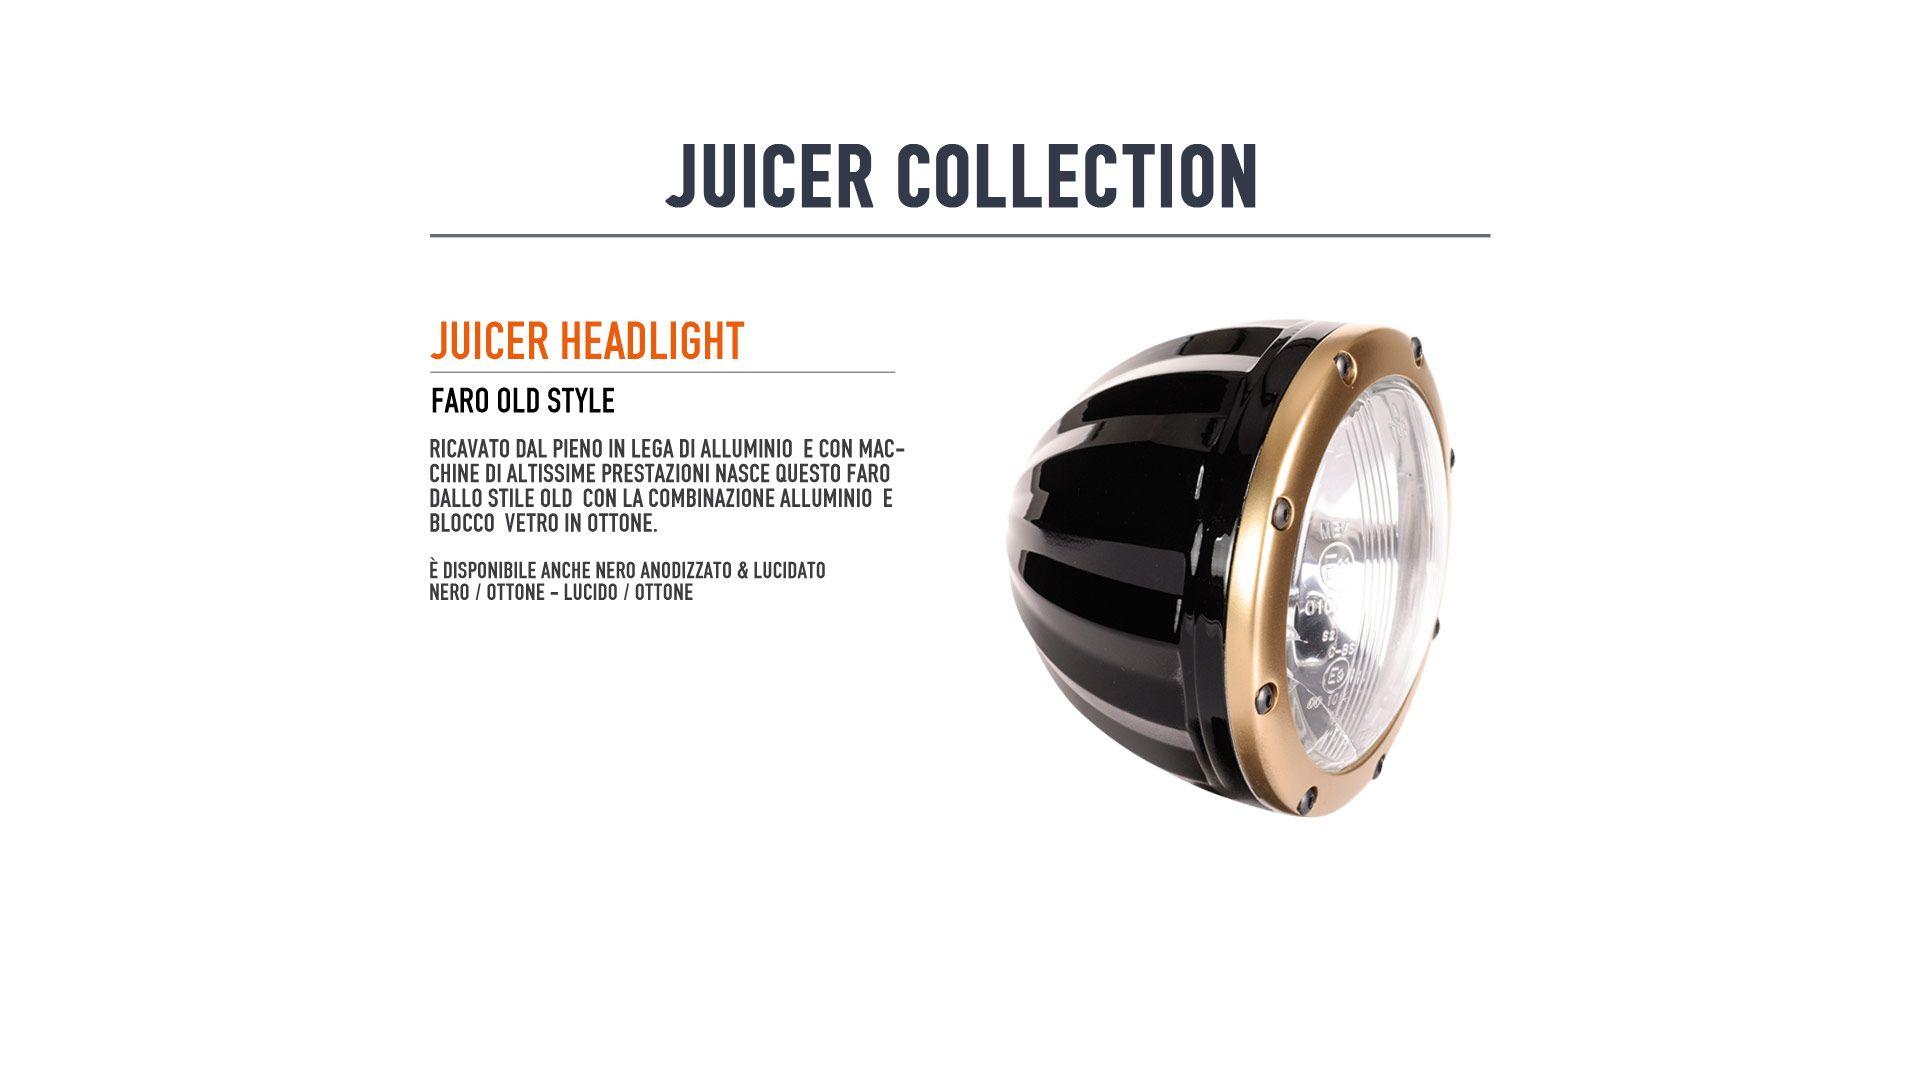 JUICER HEADLIGHT by Vity's Design